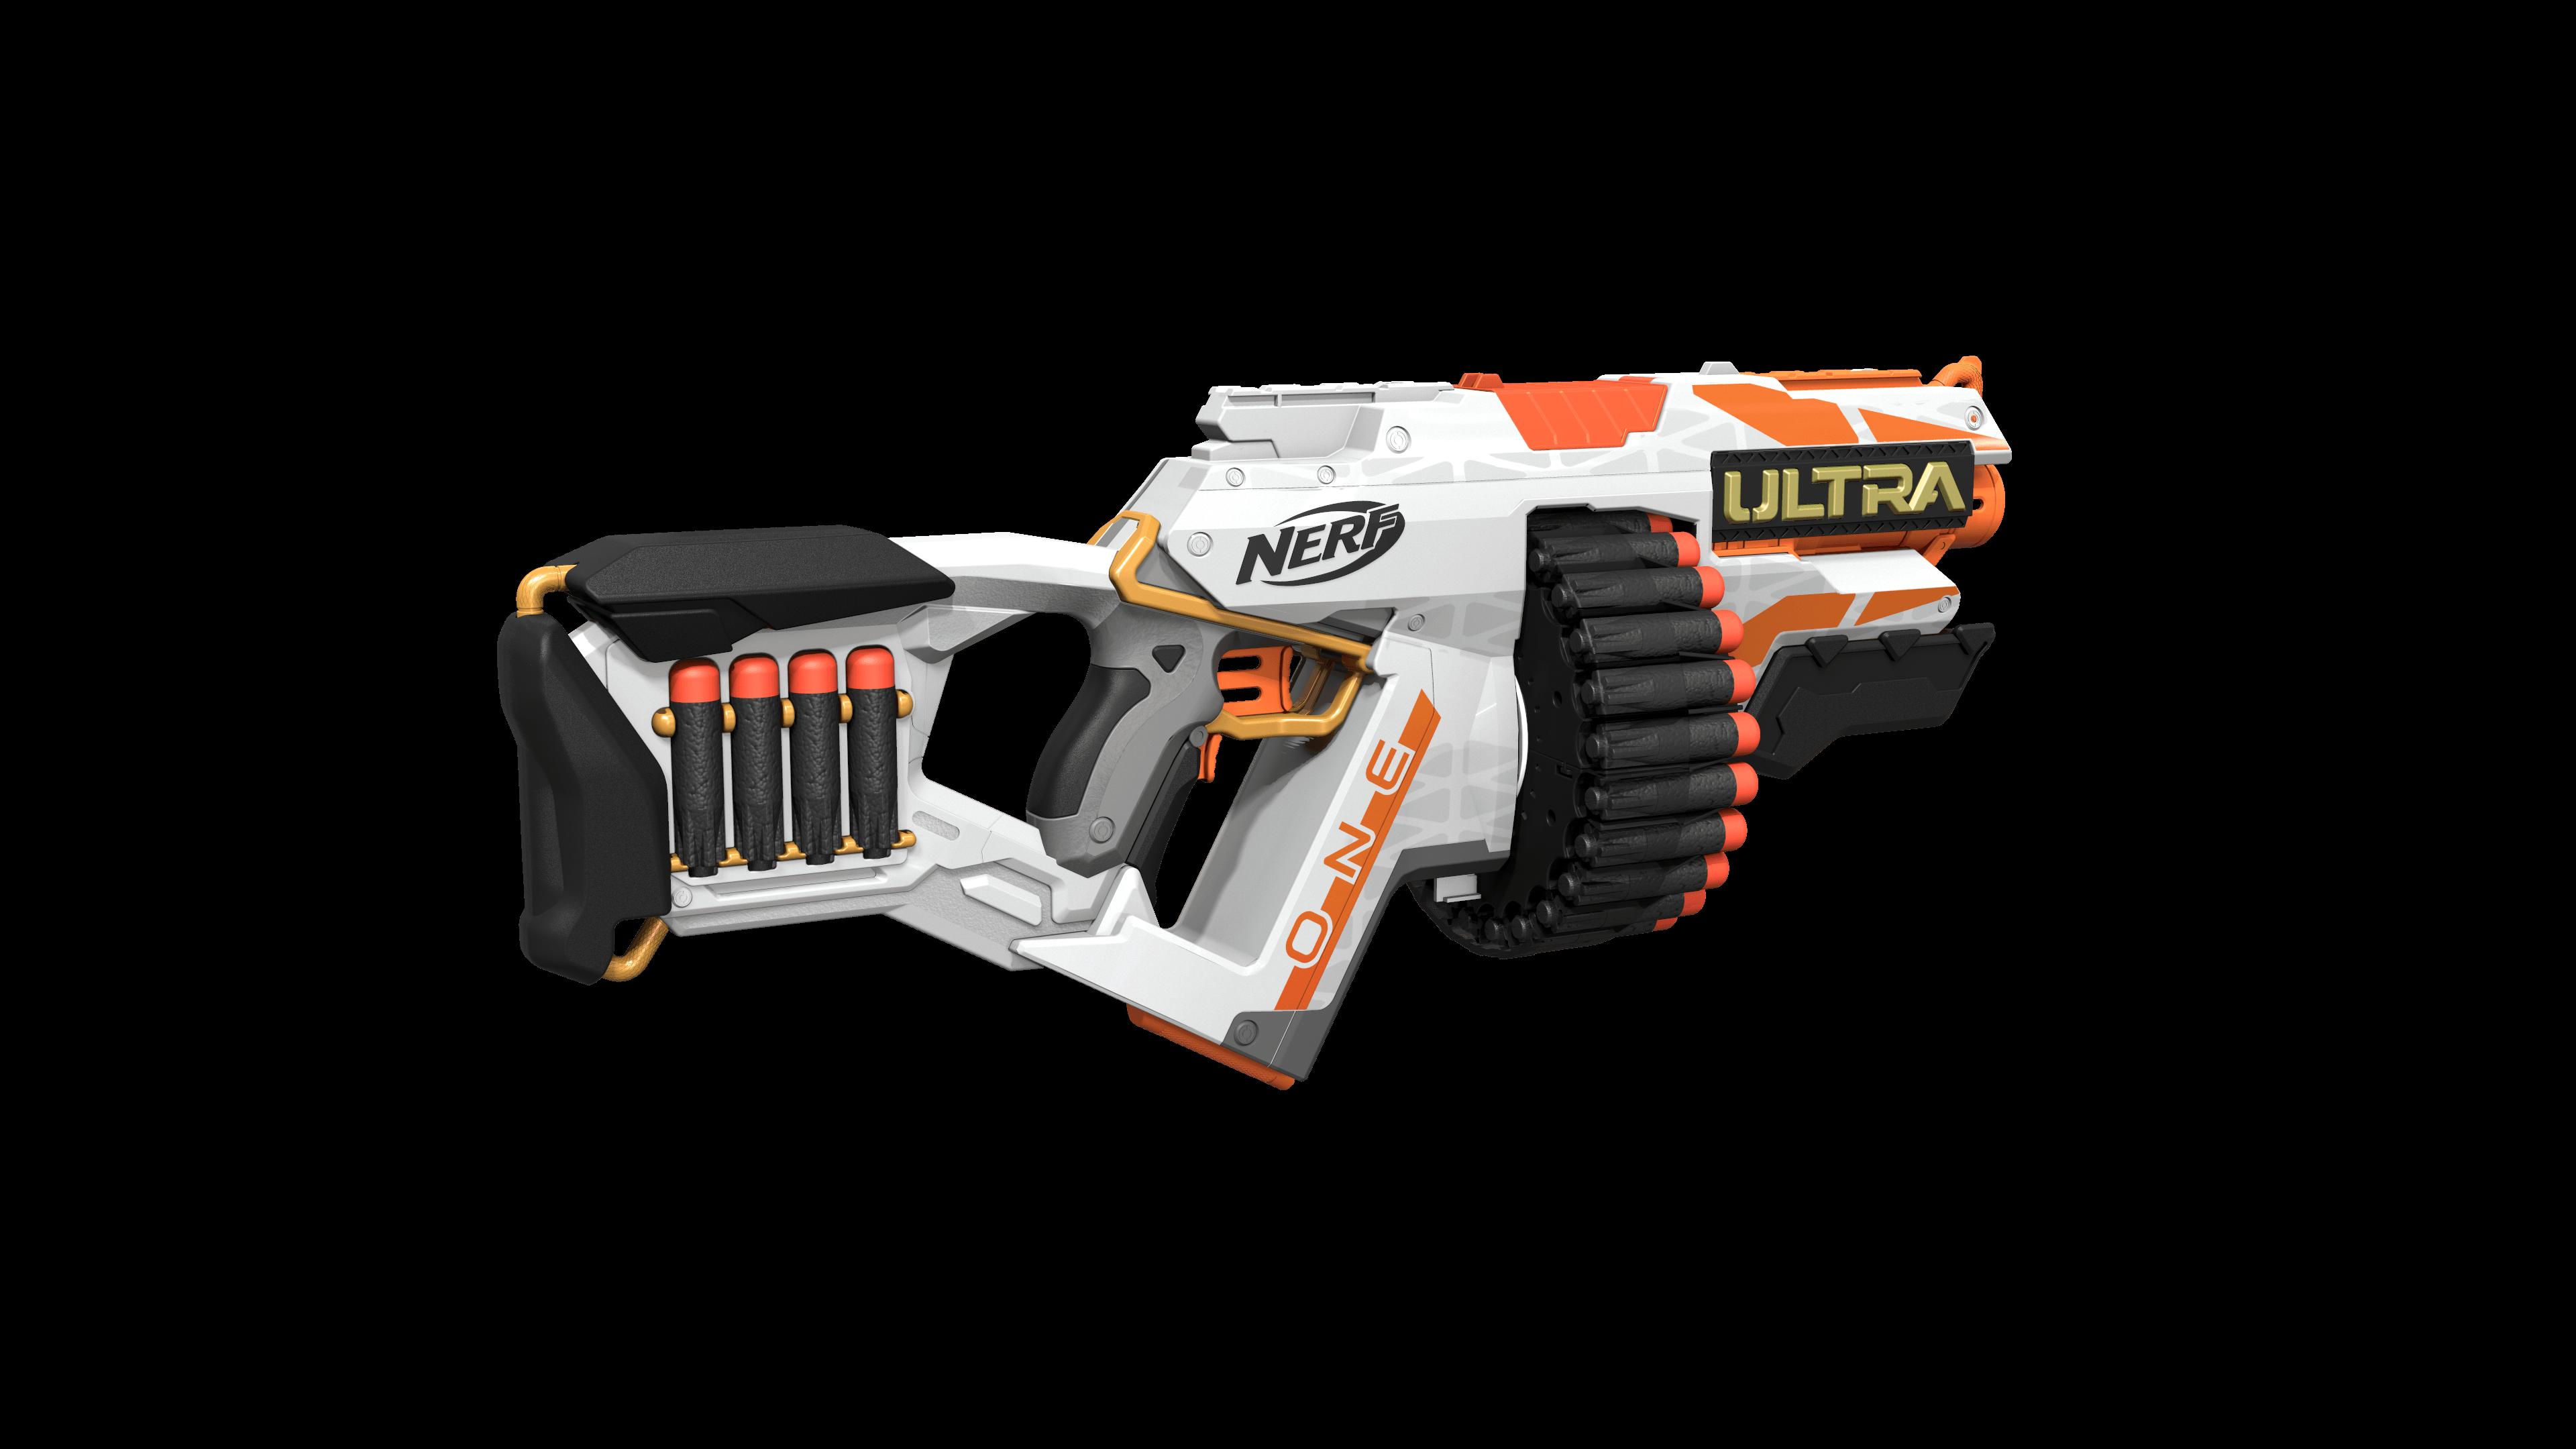 ultra blaster img 11